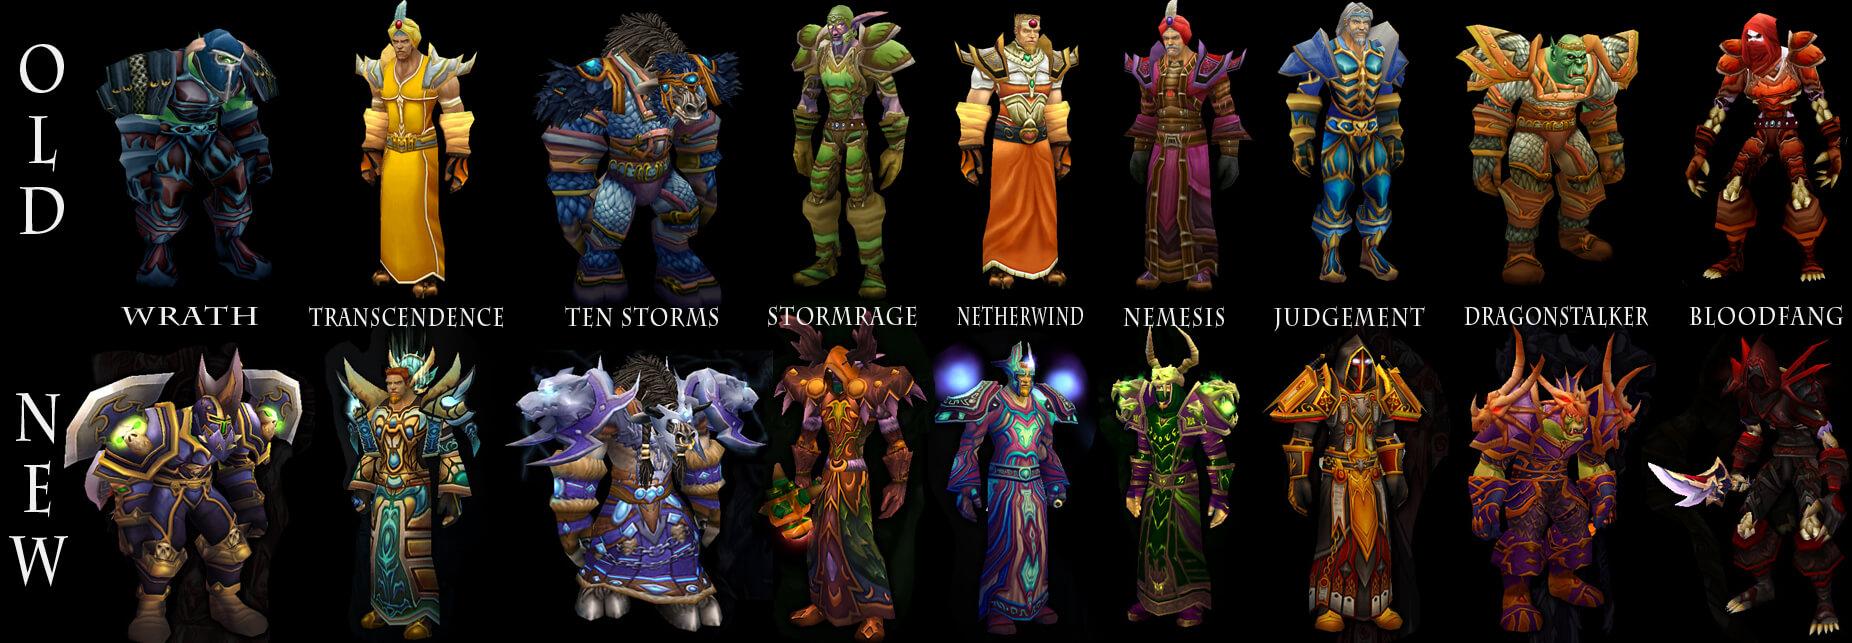 Tier 2 szettek - World of Warcraft